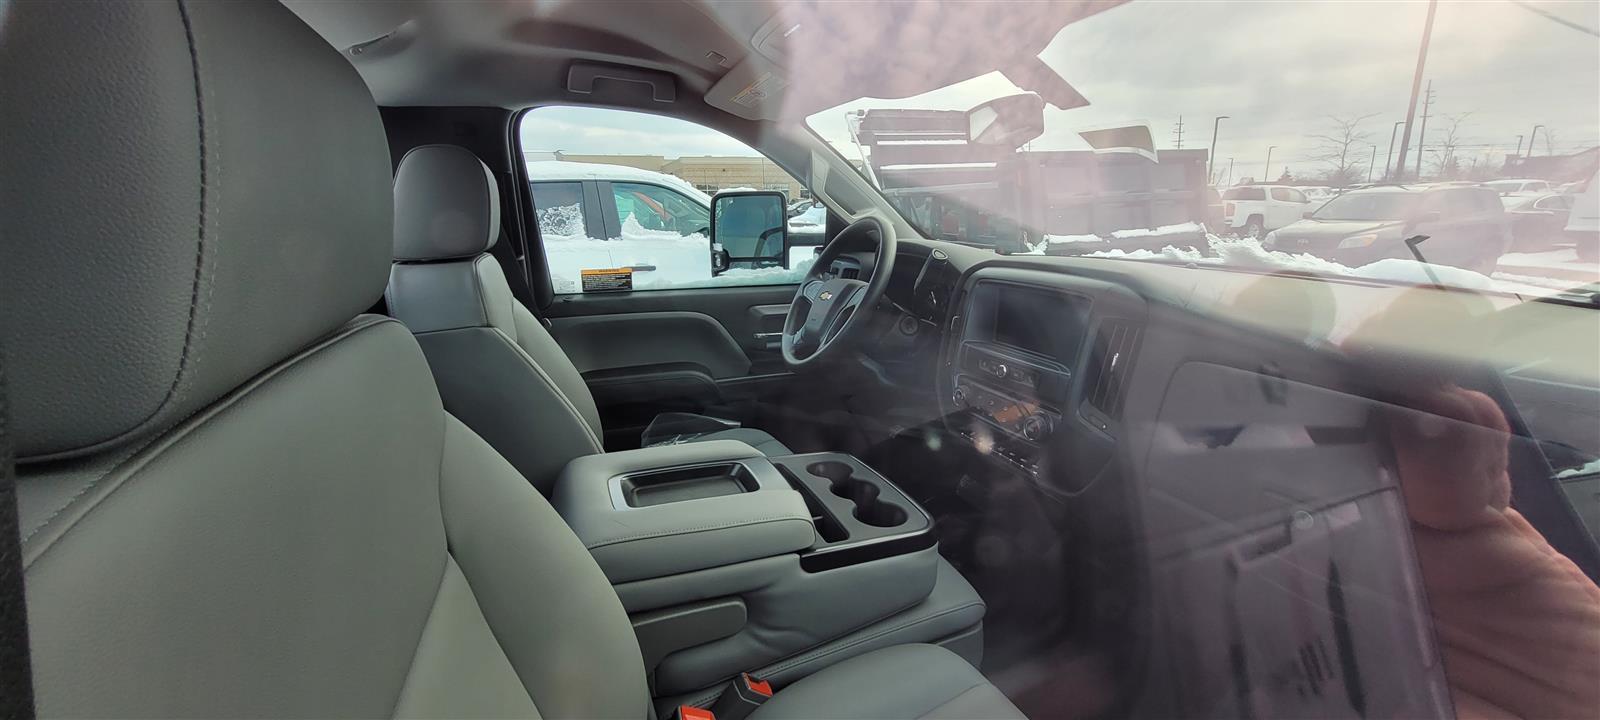 2021 Silverado 5500 Regular Cab DRW 4x2,  Cab Chassis #21CC728 - photo 6